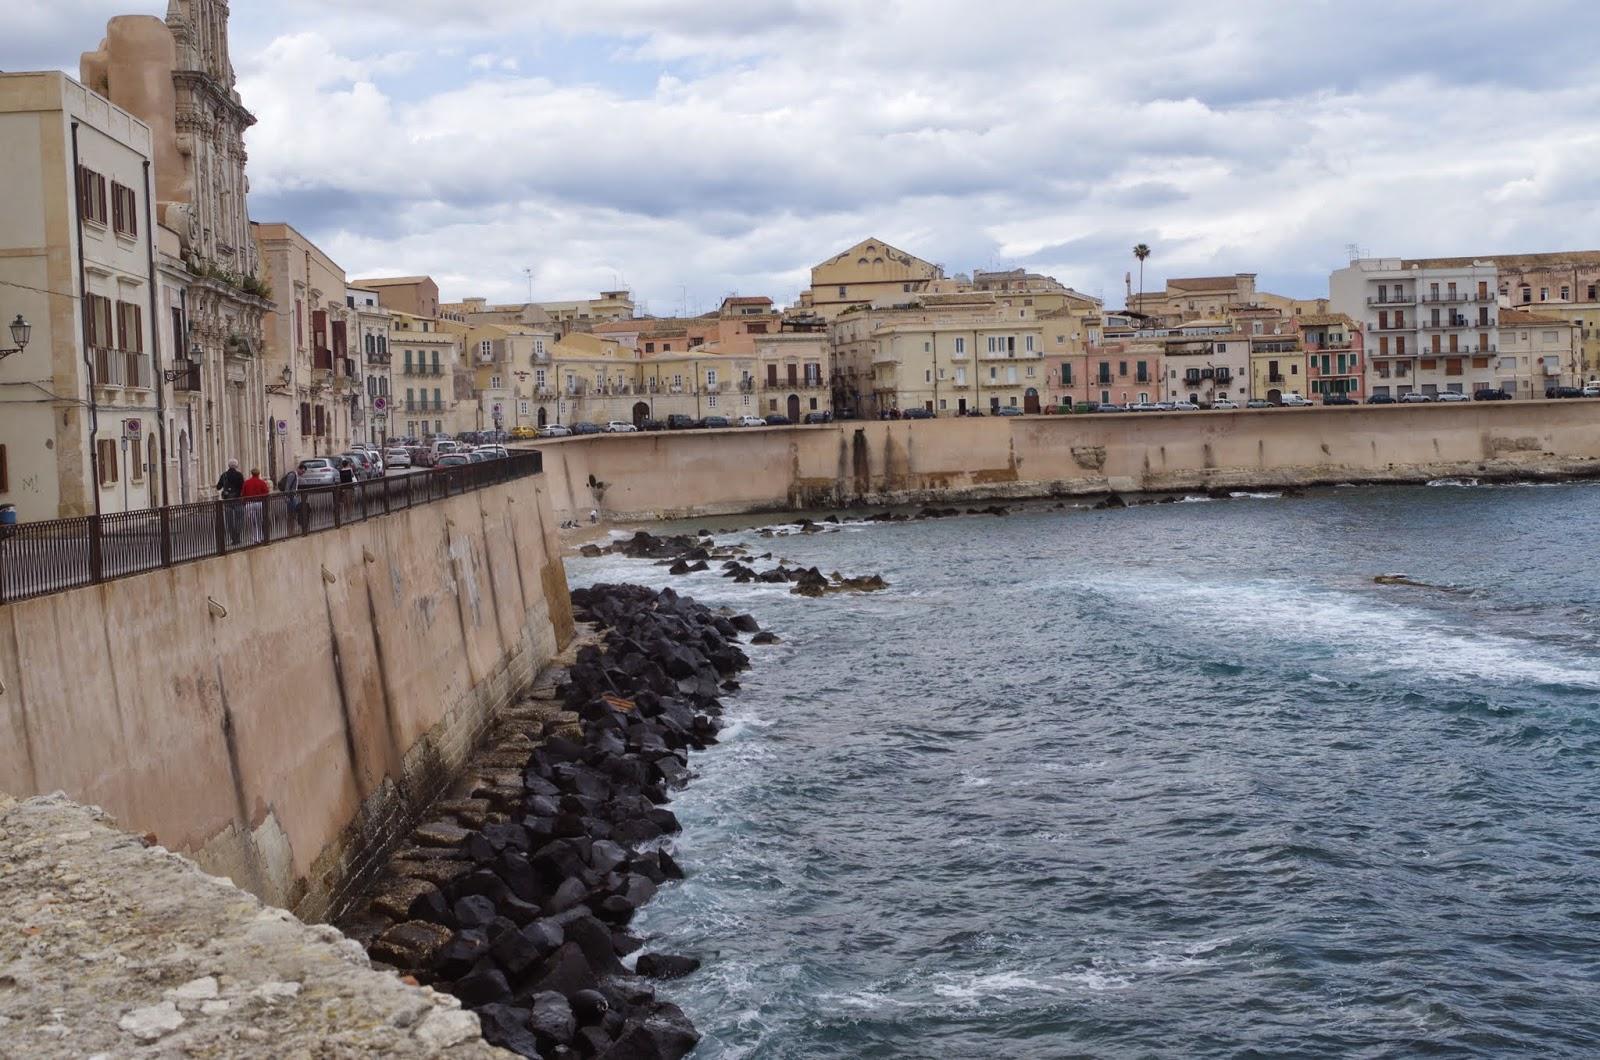 Sicilie en andere tips van Rianne Plitscher: maart 2015